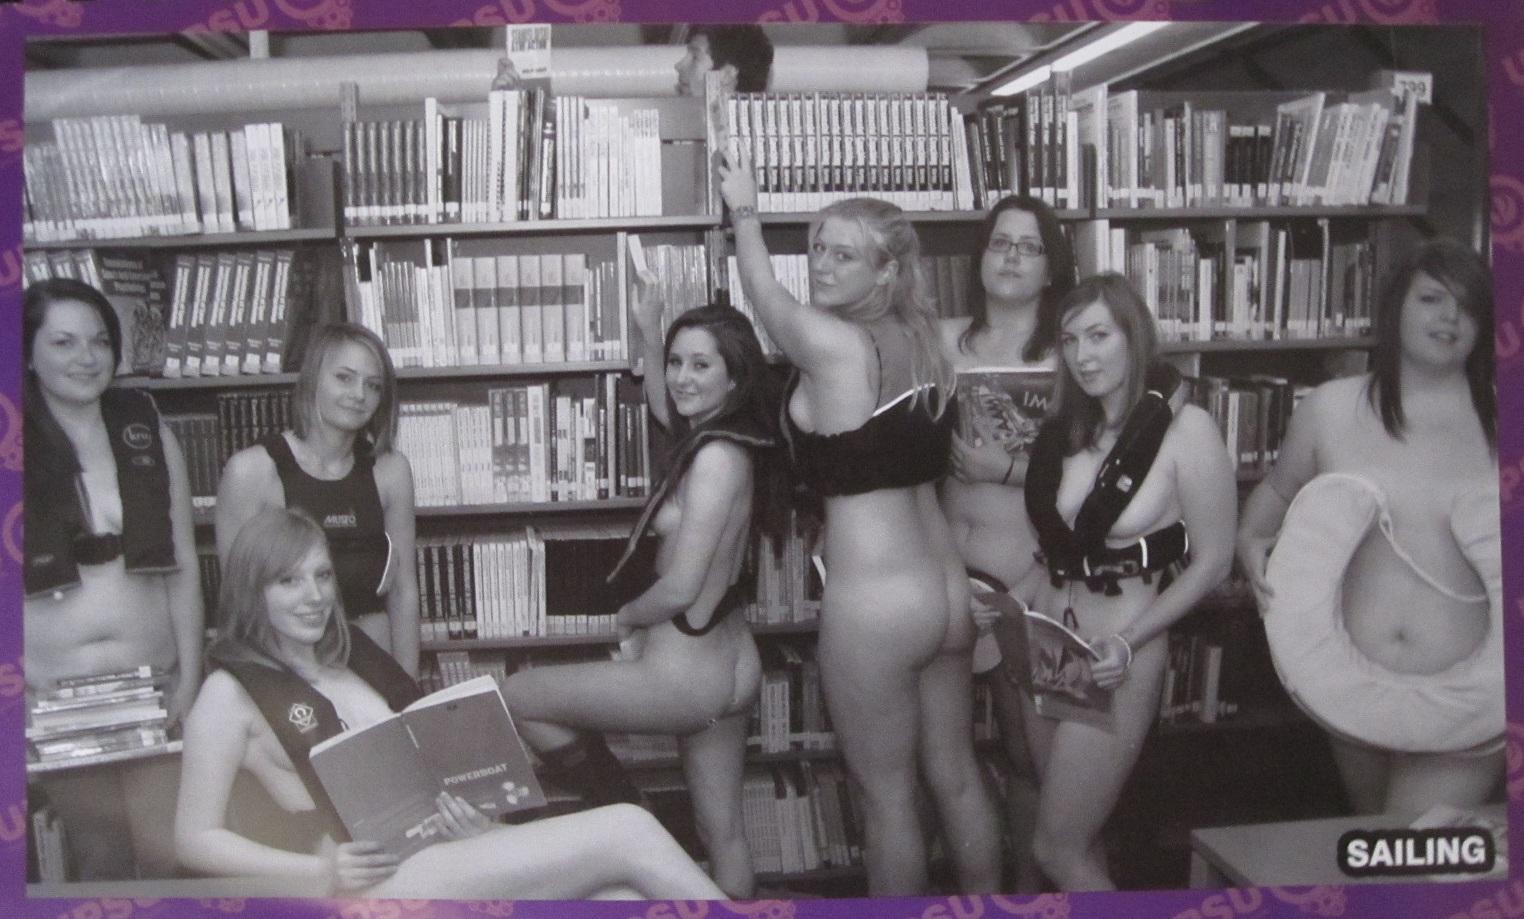 University of Portsmouth Students Union naked calendar